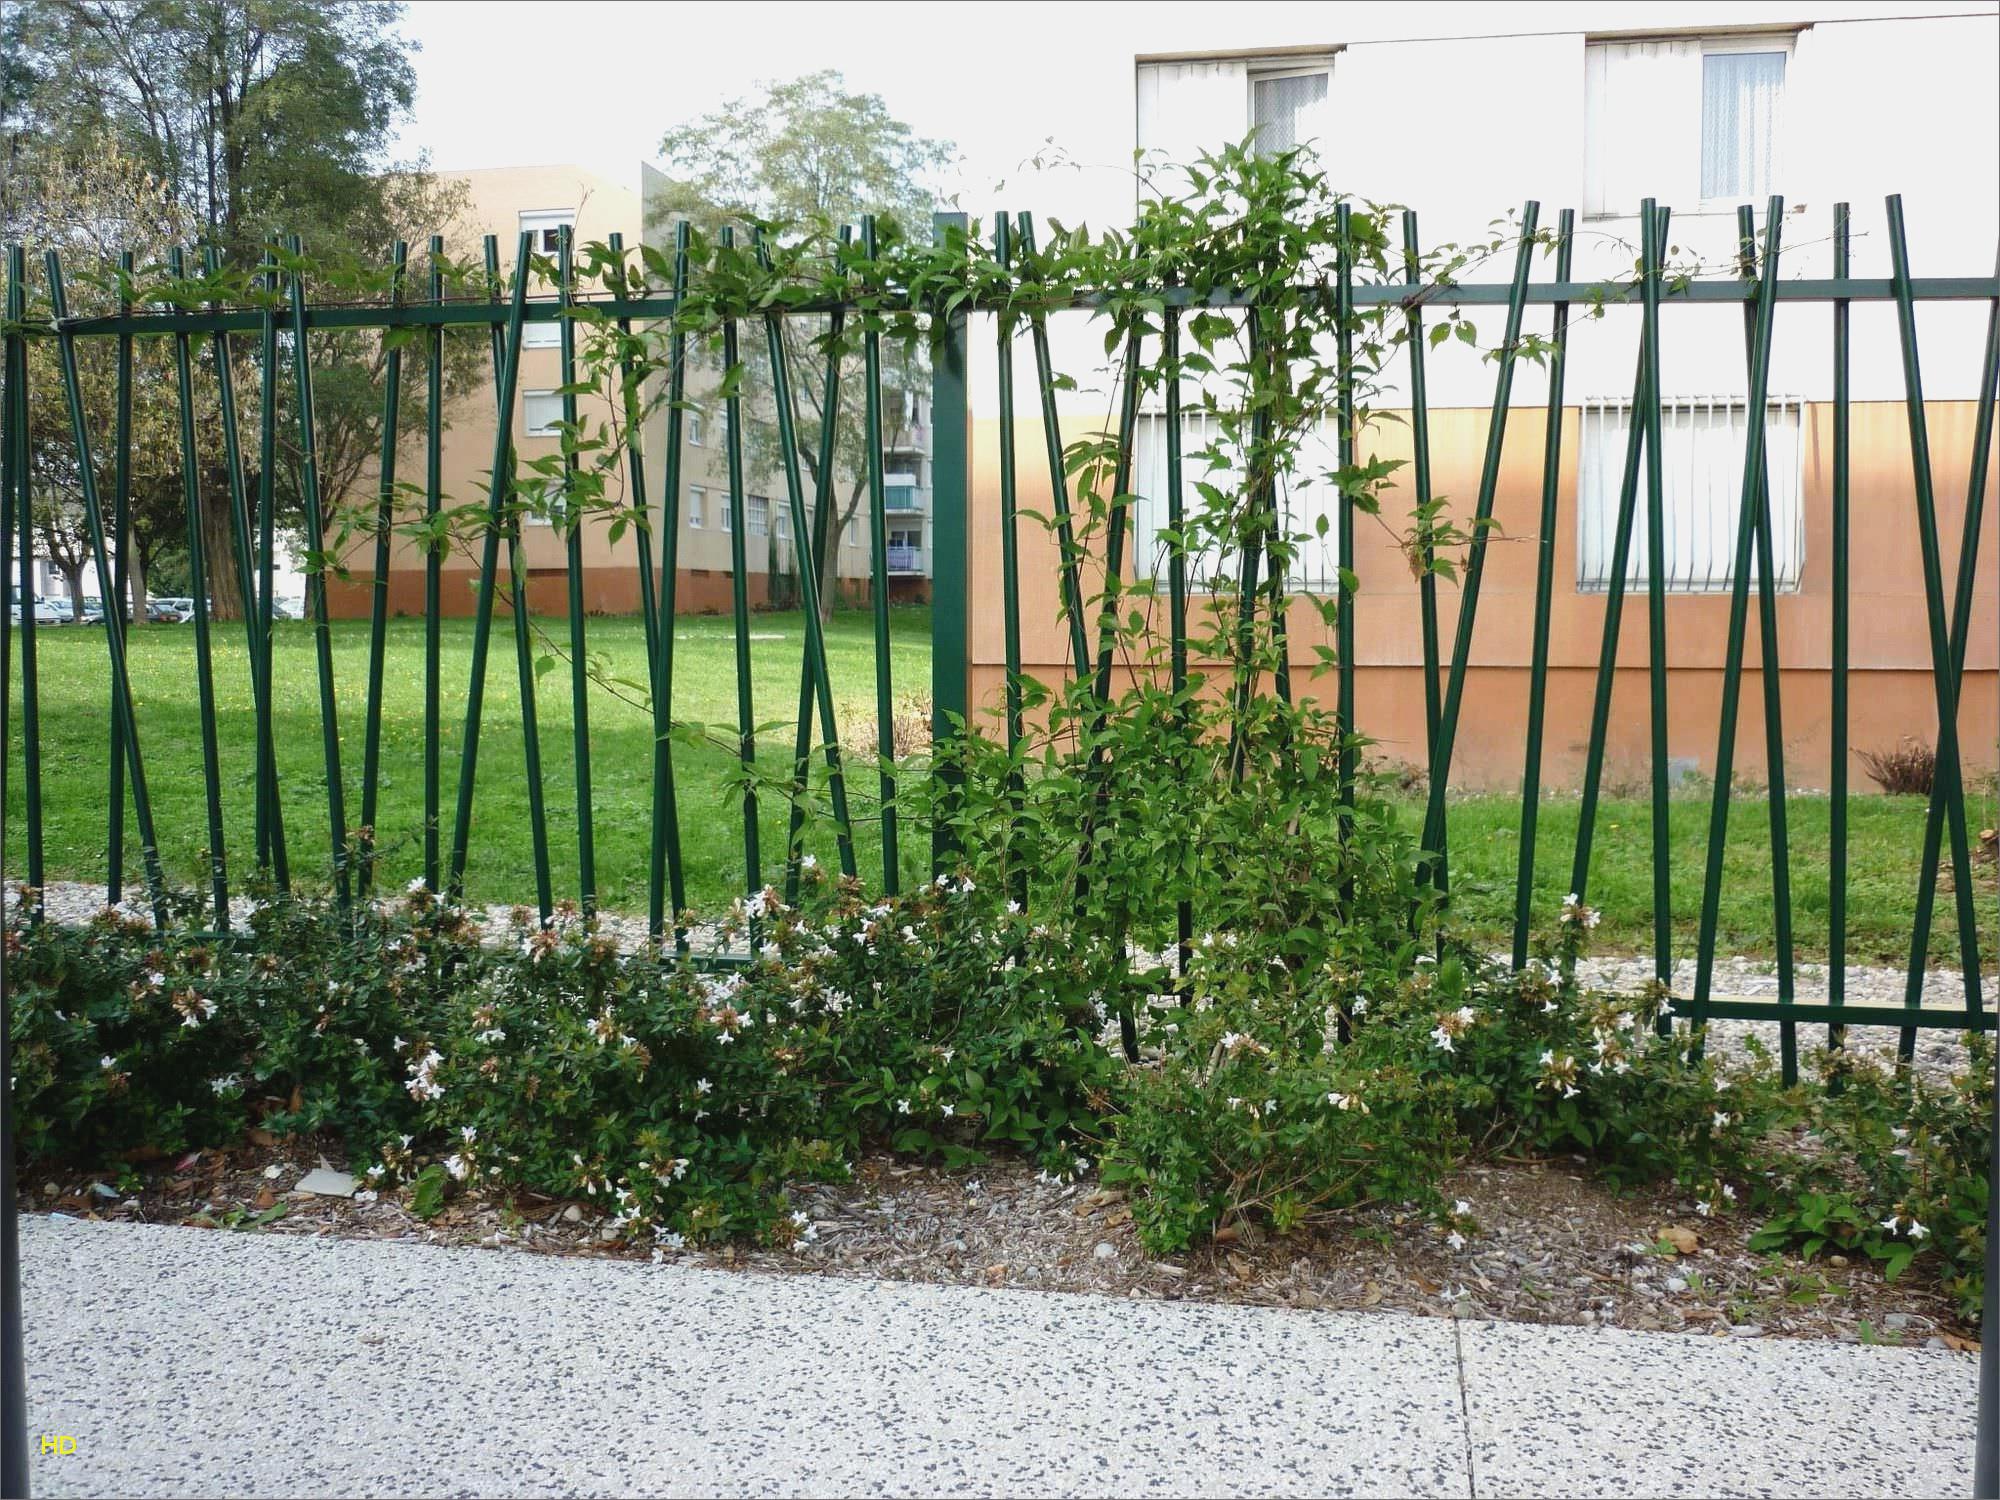 Idee Deco Interieur Cabane En Bois Beau Stock Inspirant Cabanon De Jardin En Bois